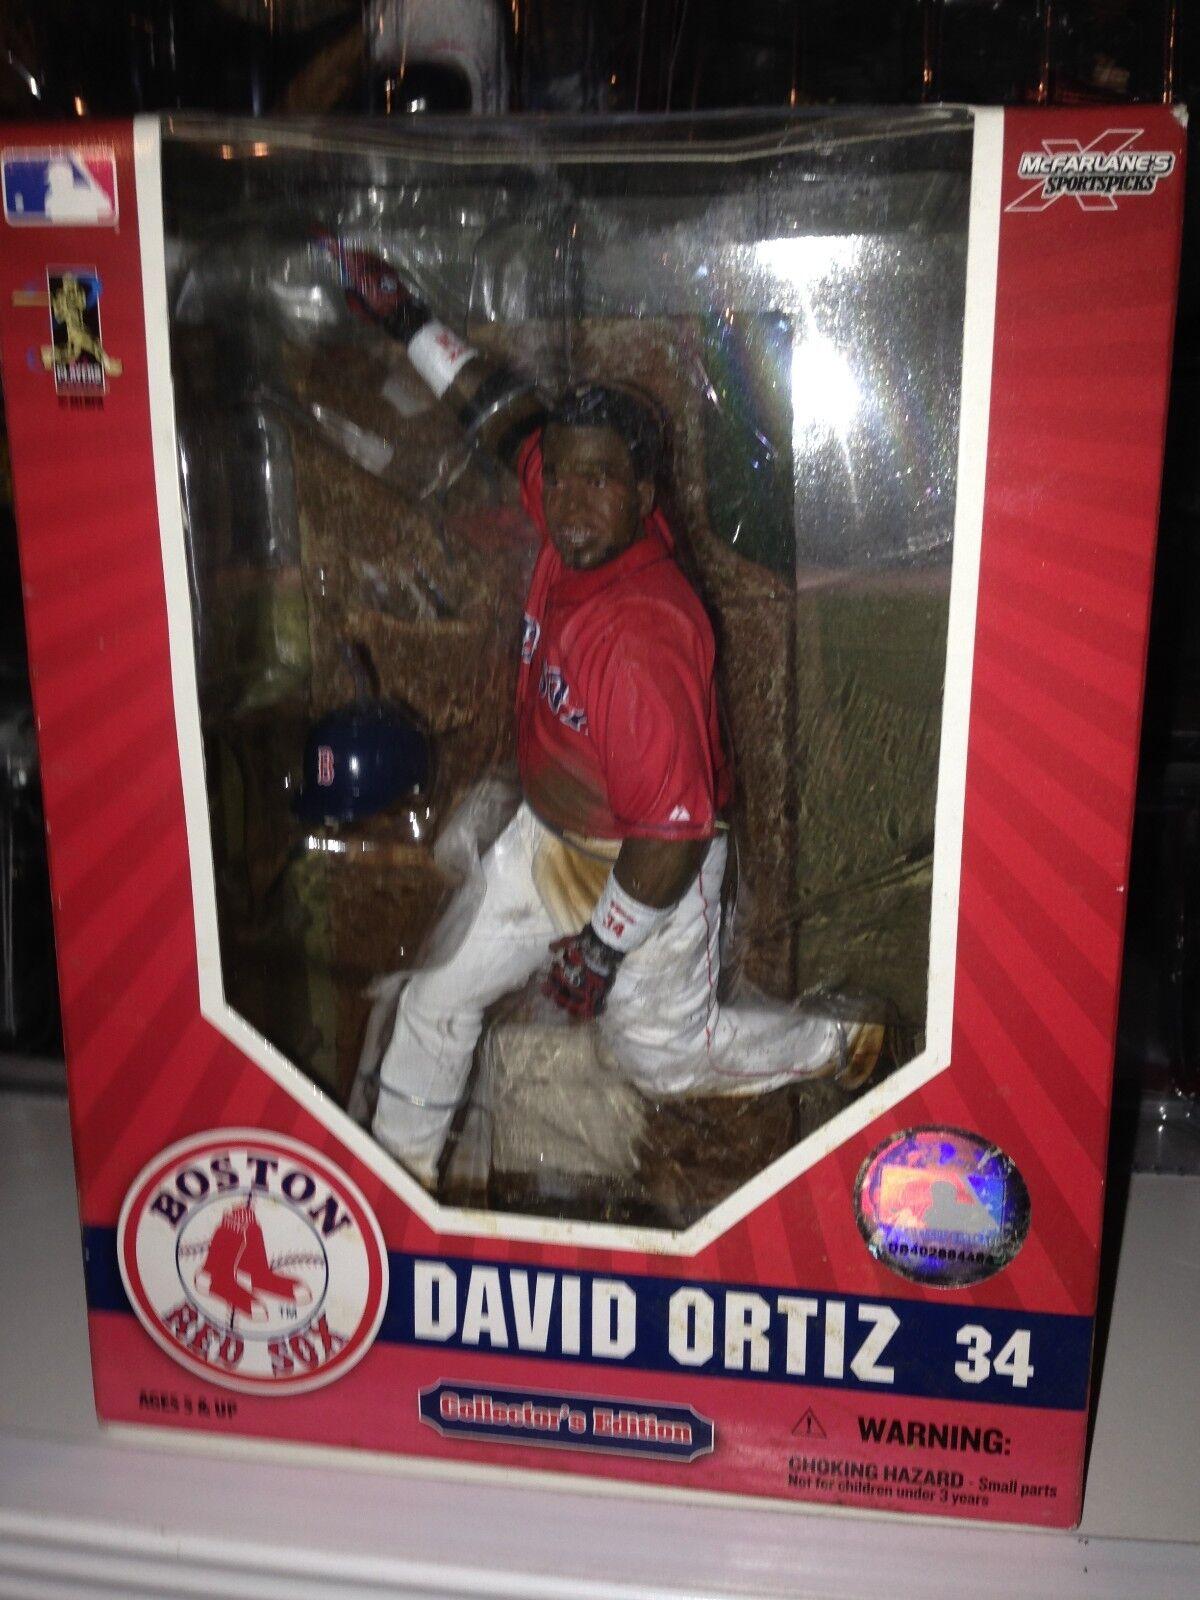 MCFARLANE MLB RED SOX LOT ORTIZ DREW PAPELBON RAMIREZ RAMIREZ RAMIREZ LOWELL ELLSBURY RED JERSEY 09f5ab